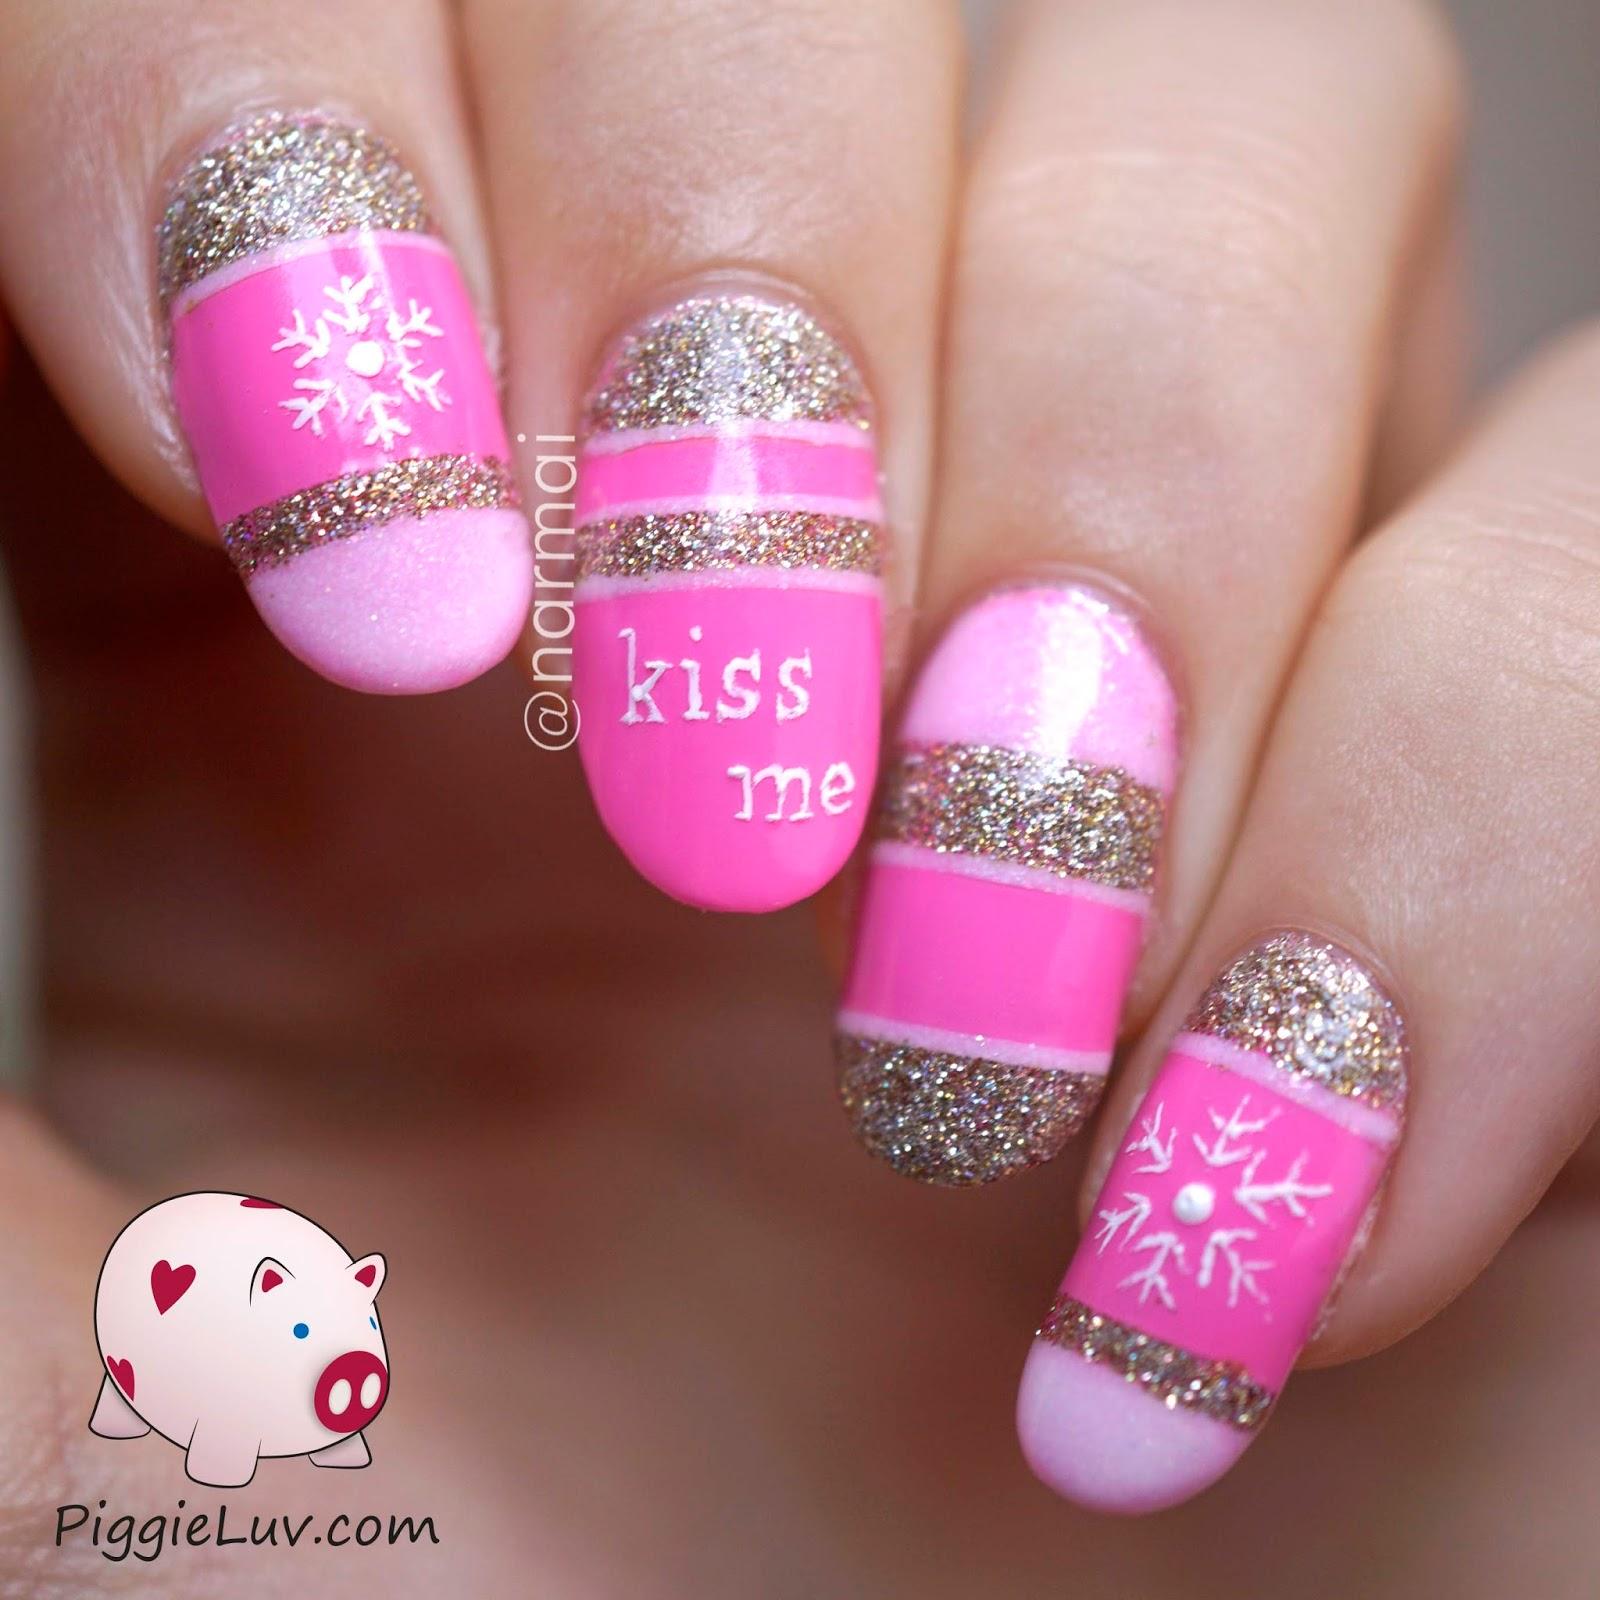 Piggieluv Kiss Me Nail Art With Snowflakes